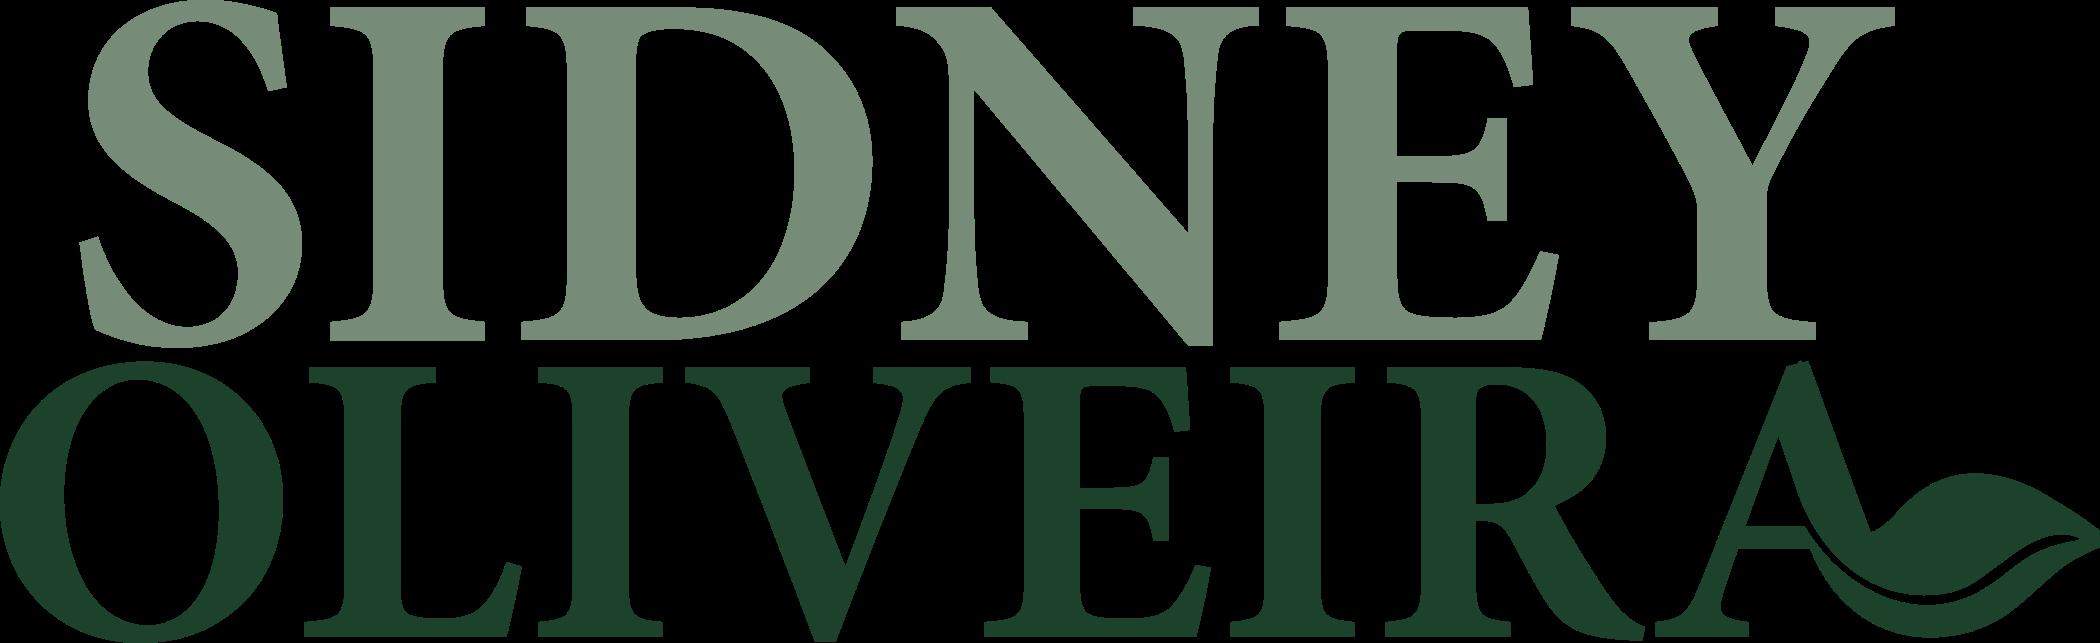 sidney oliveira logo 1 - Sidney Oliveira Logo